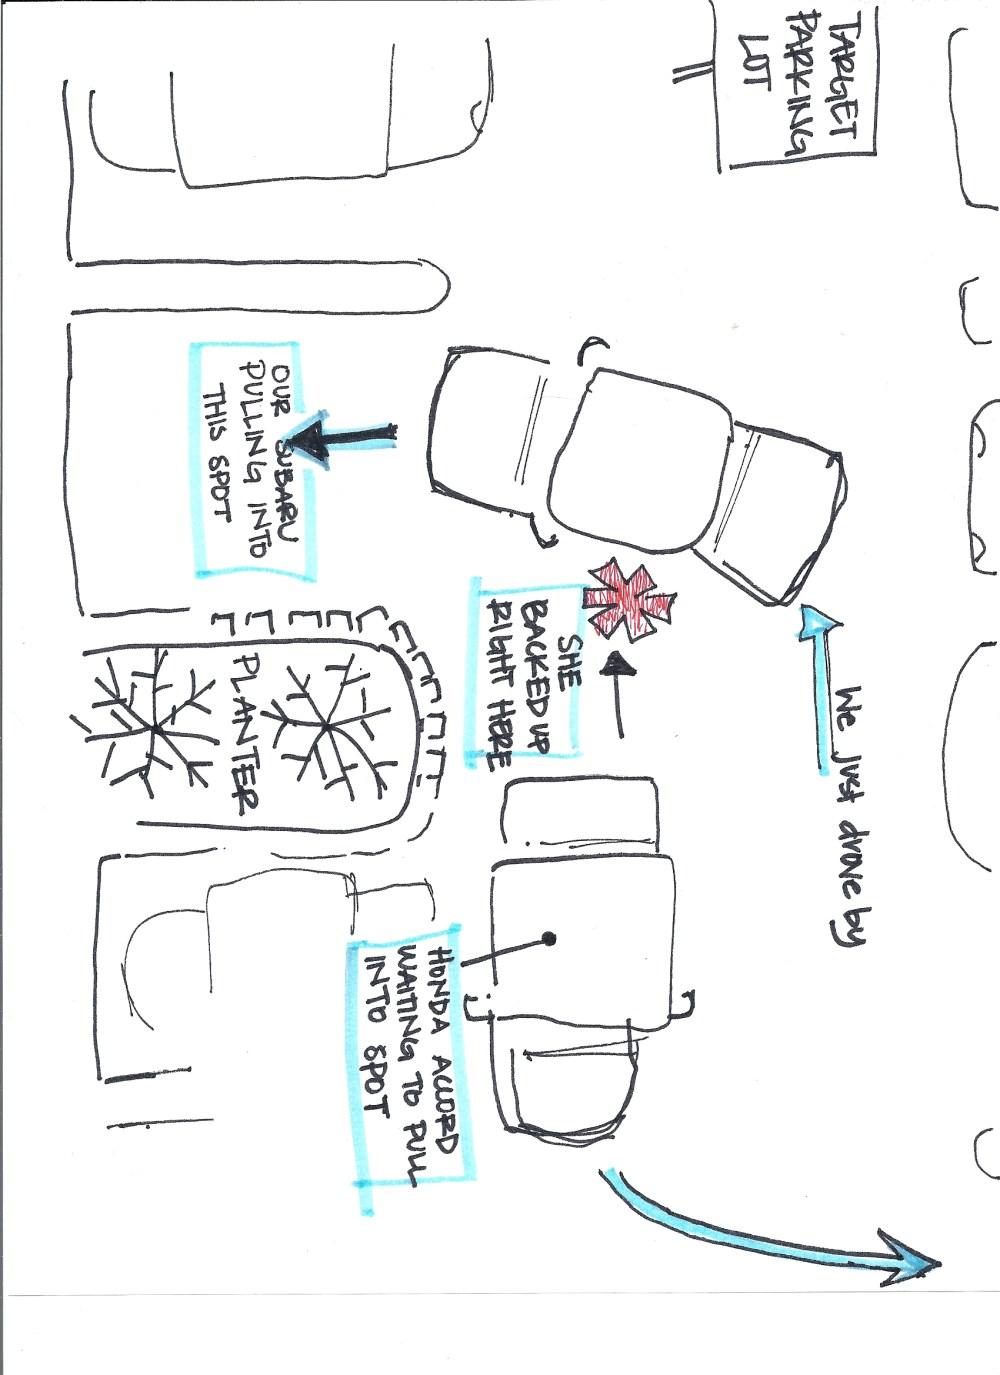 medium resolution of draw accident diagram related keywords u0026 suggestions draw accidentcar accident draw diagram